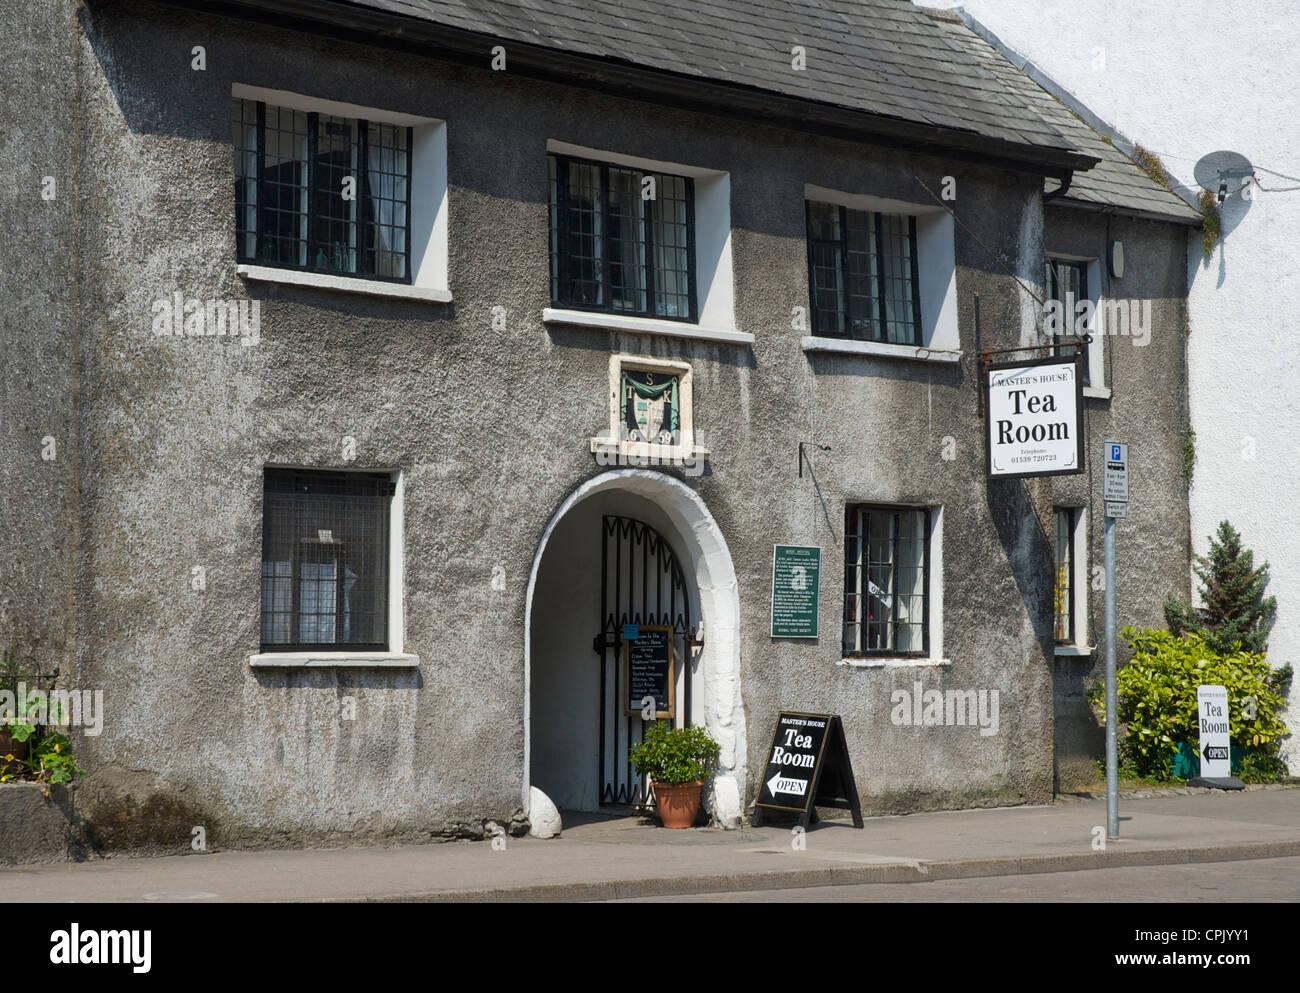 Facade of Sandes Hospital, with datestone of 1659, Highgate, Kendal Cumbria, England UK - Stock Image